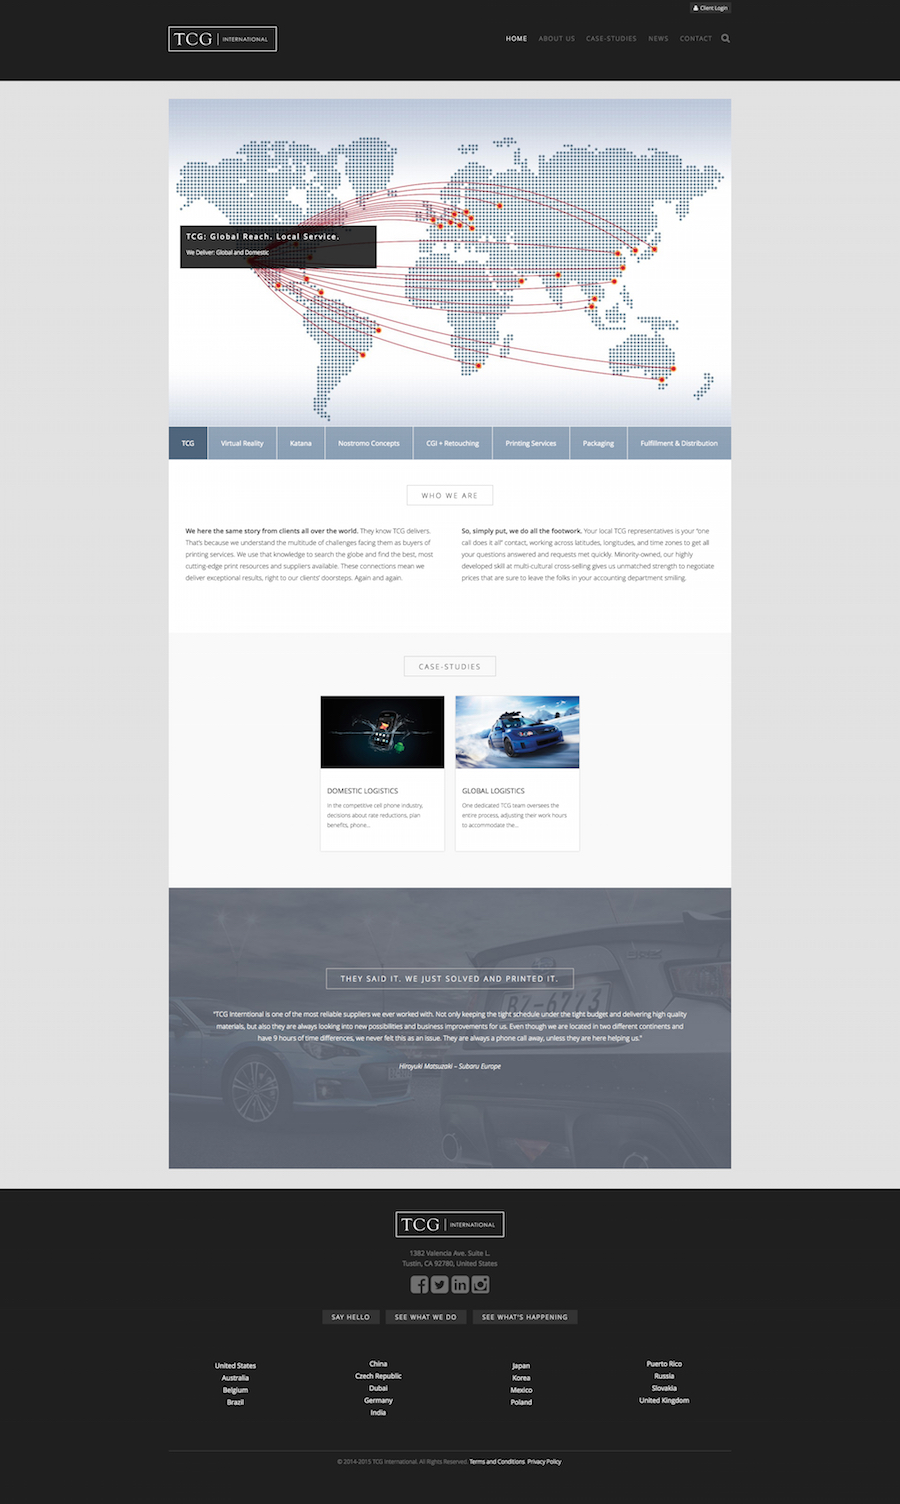 TCG International Home page